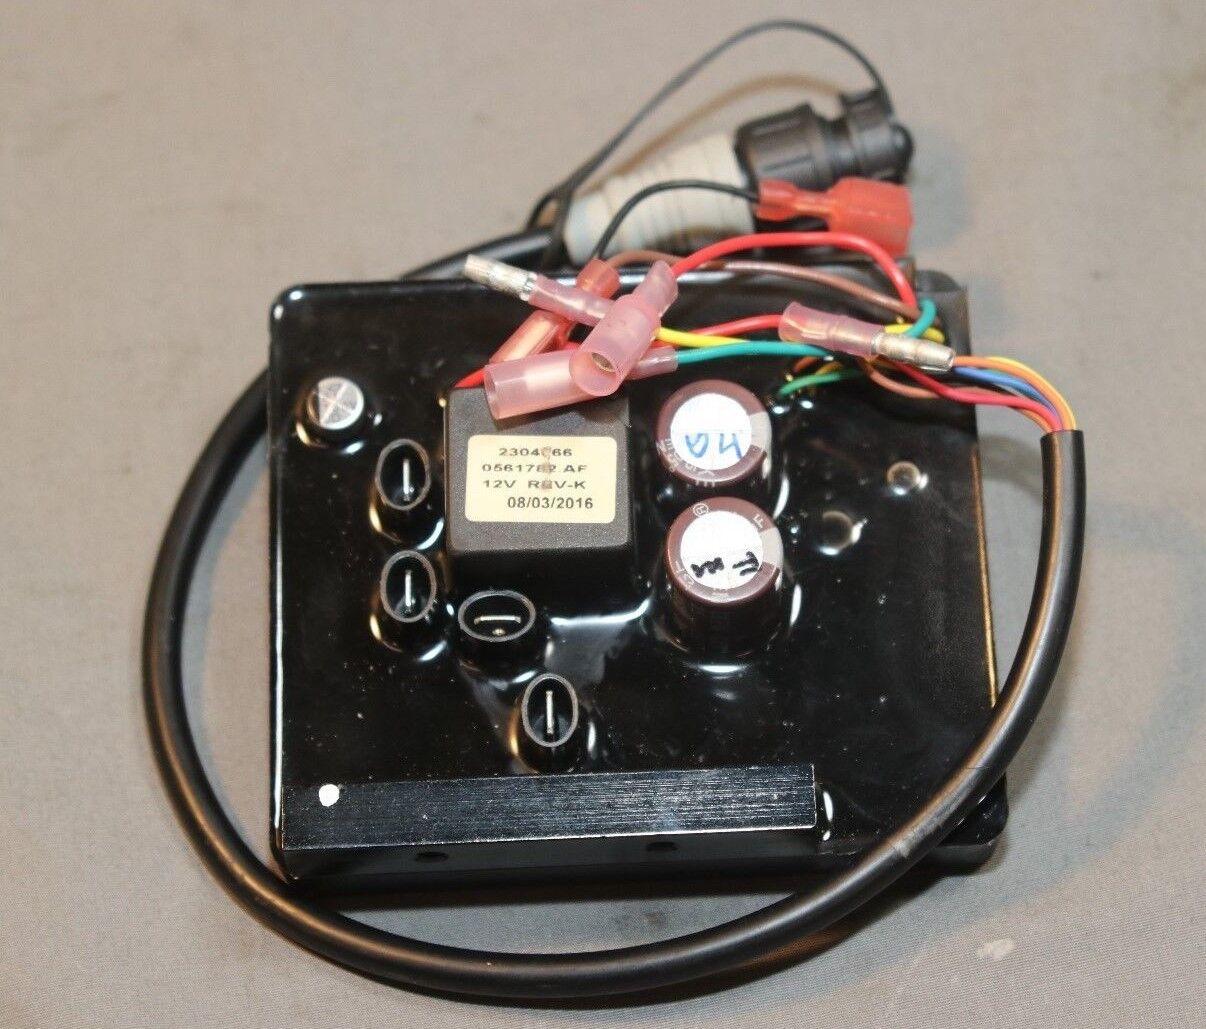 Minn Kota Board-12v V2 W / 2884057 Ap mit Shrnk Autopilot 2884057 / d14d90